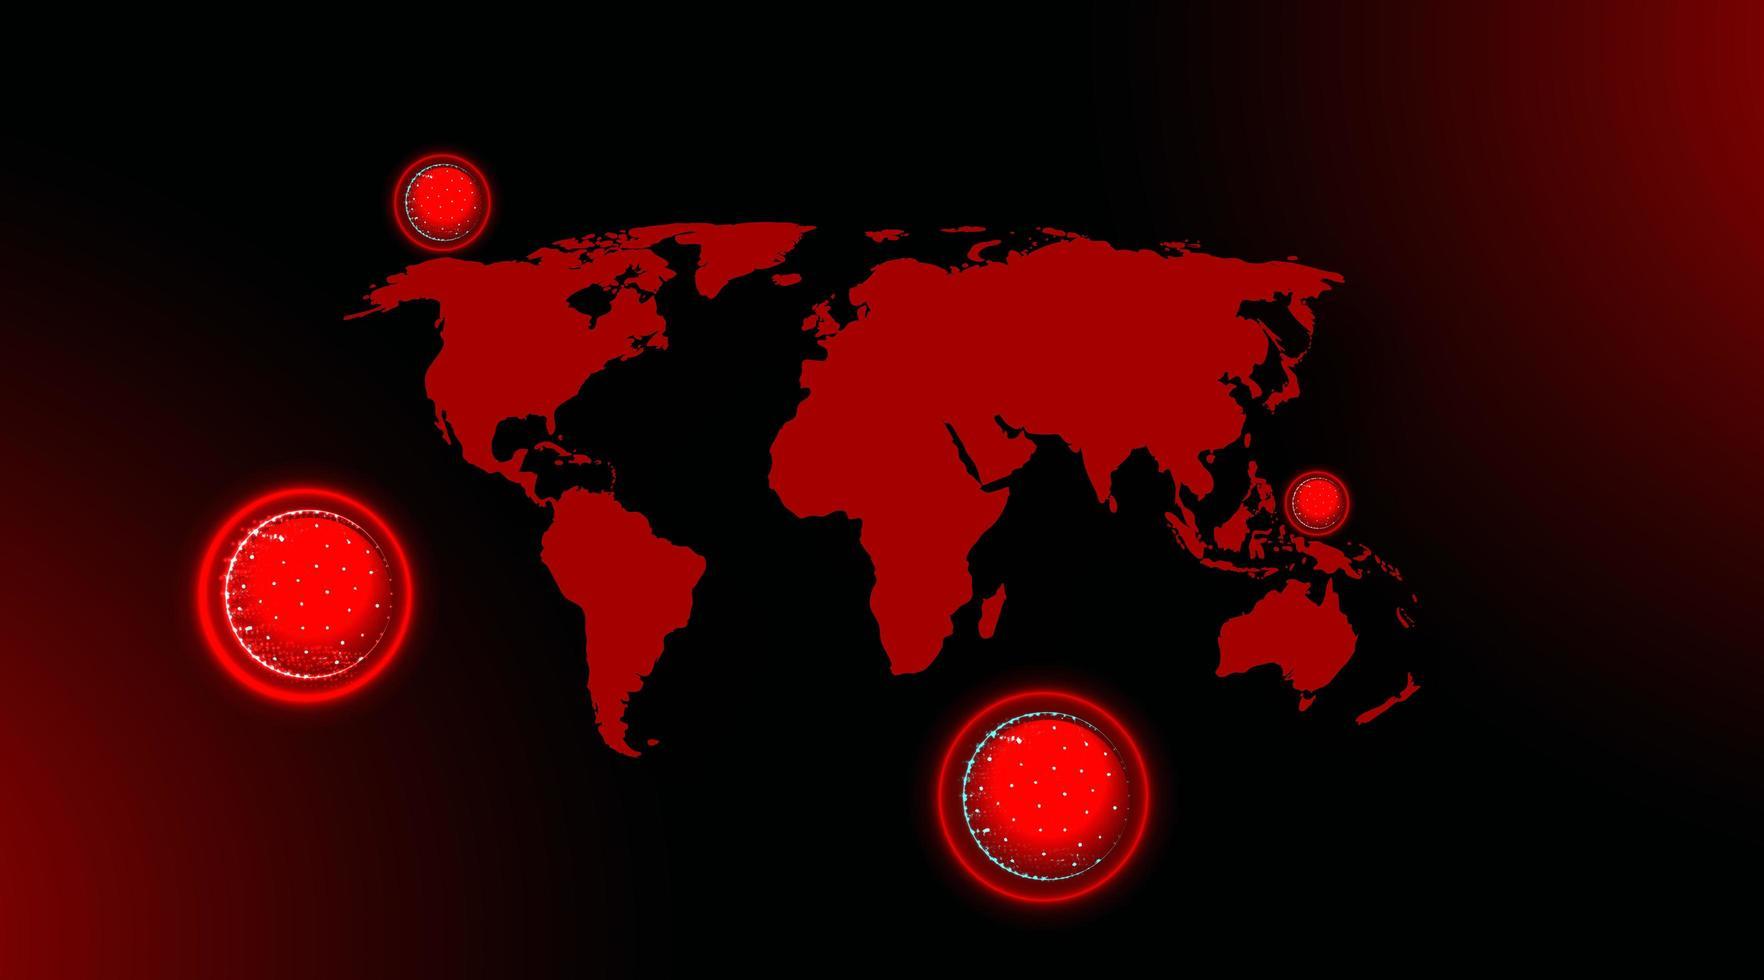 rote Karte des Atemwegsvirus 2019-ncov vektor